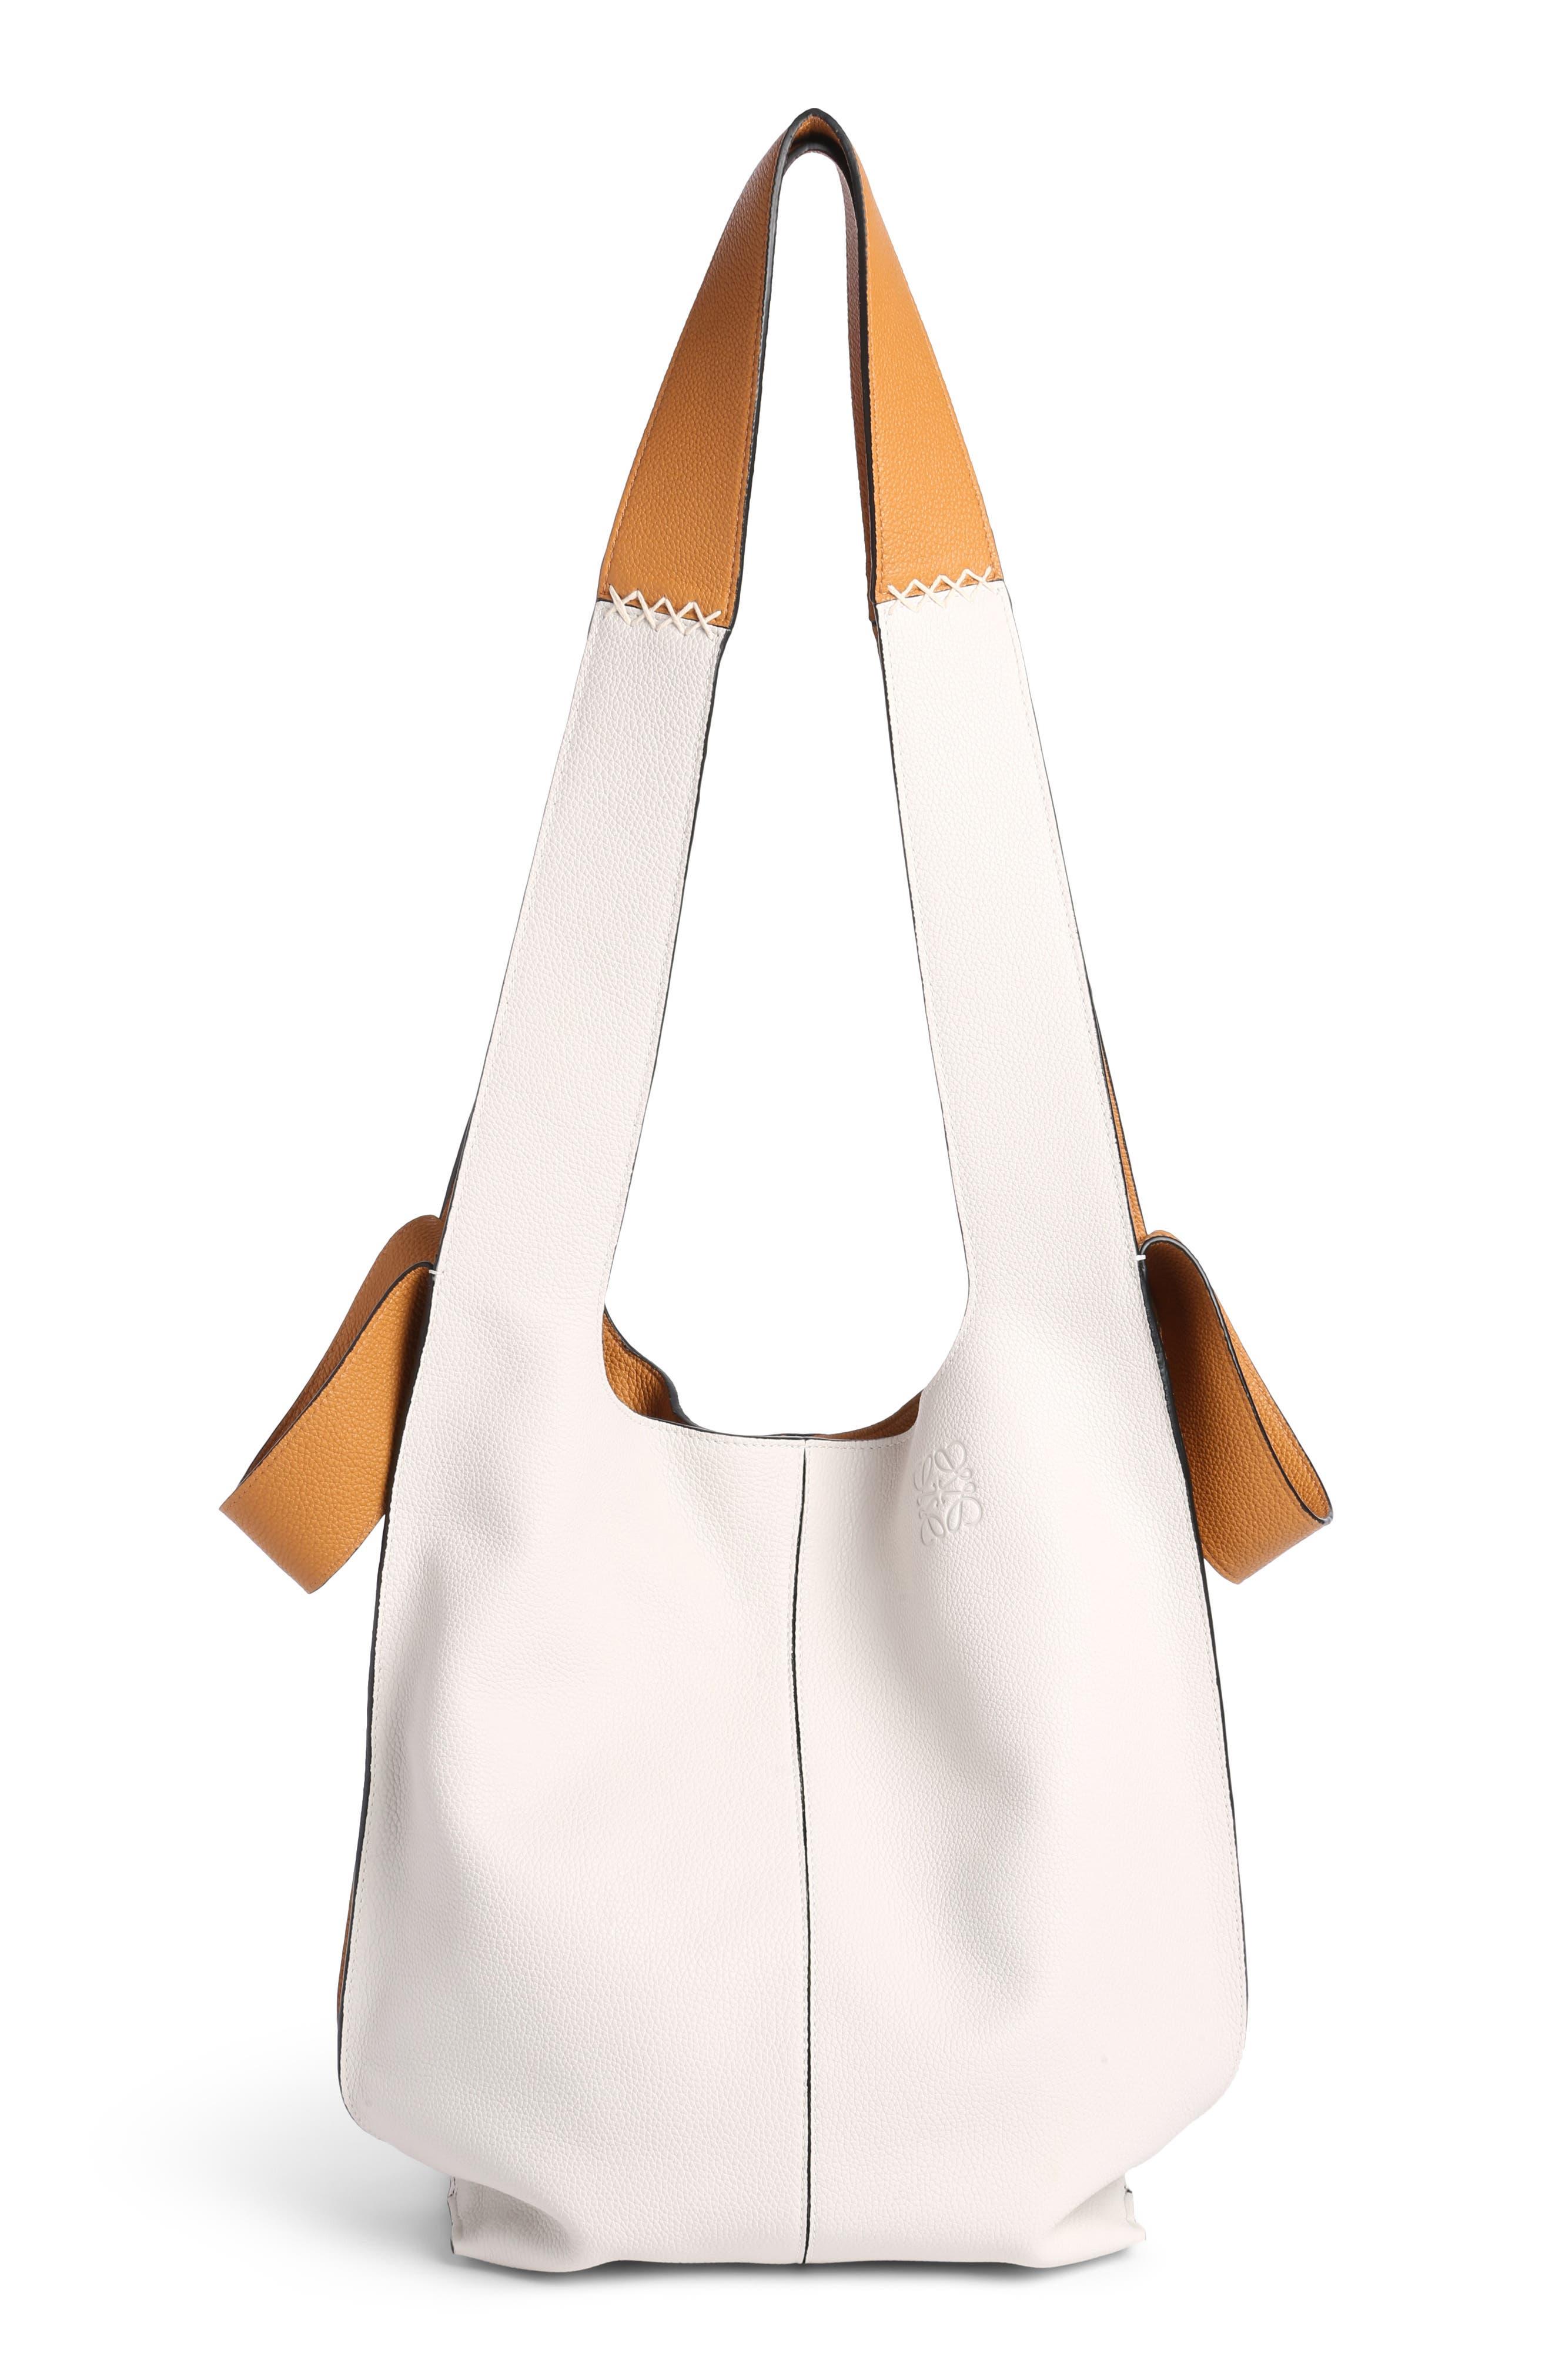 Leather Hobo Tote Bag,                             Main thumbnail 1, color,                             Soft White/ Amber